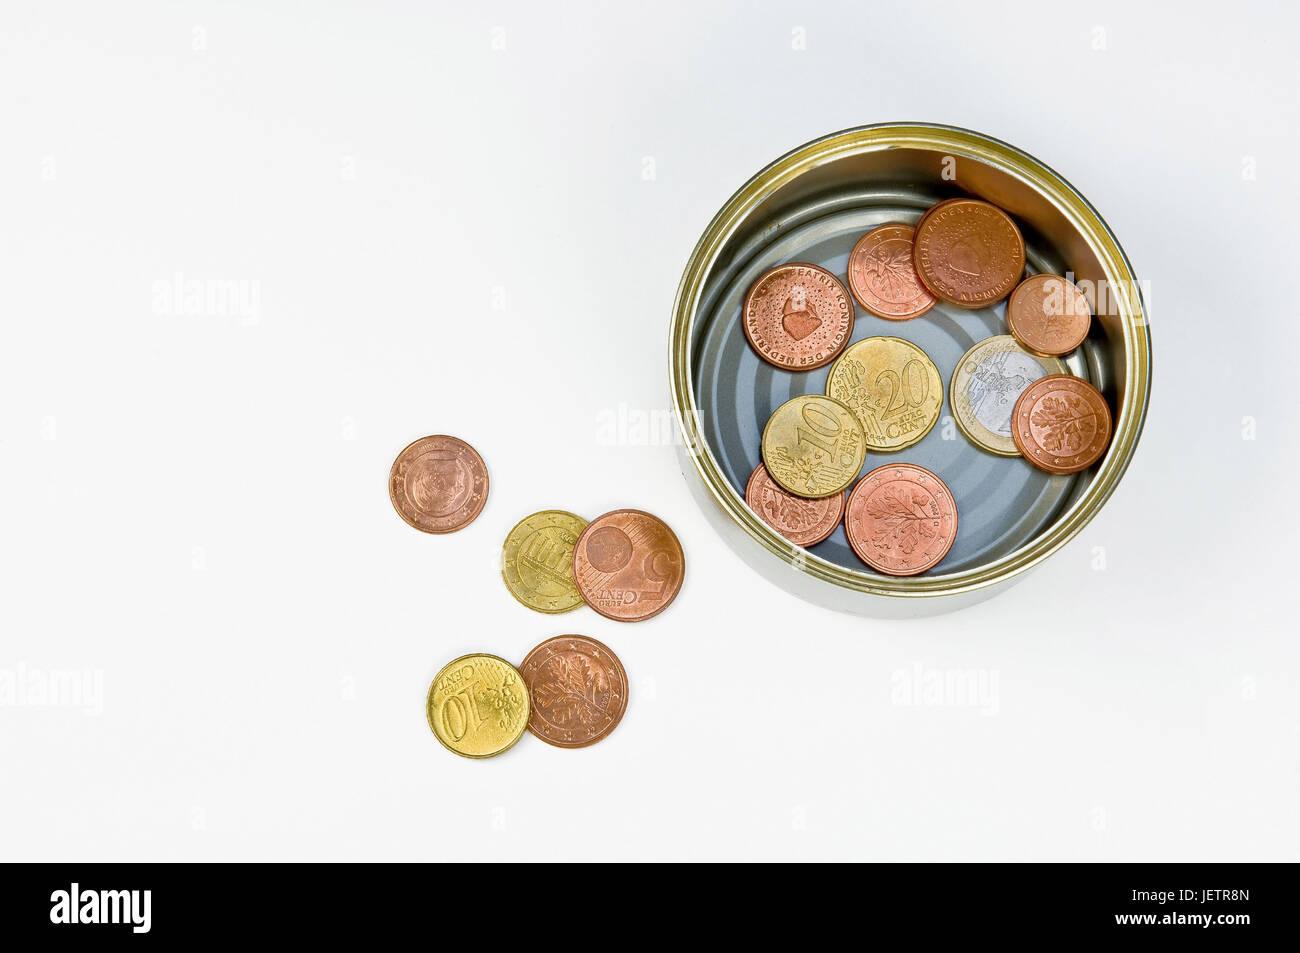 Canned food tin with coins, some are quite wrong, Konservendose mit Muenzen, einige liegen daneben - Stock Image